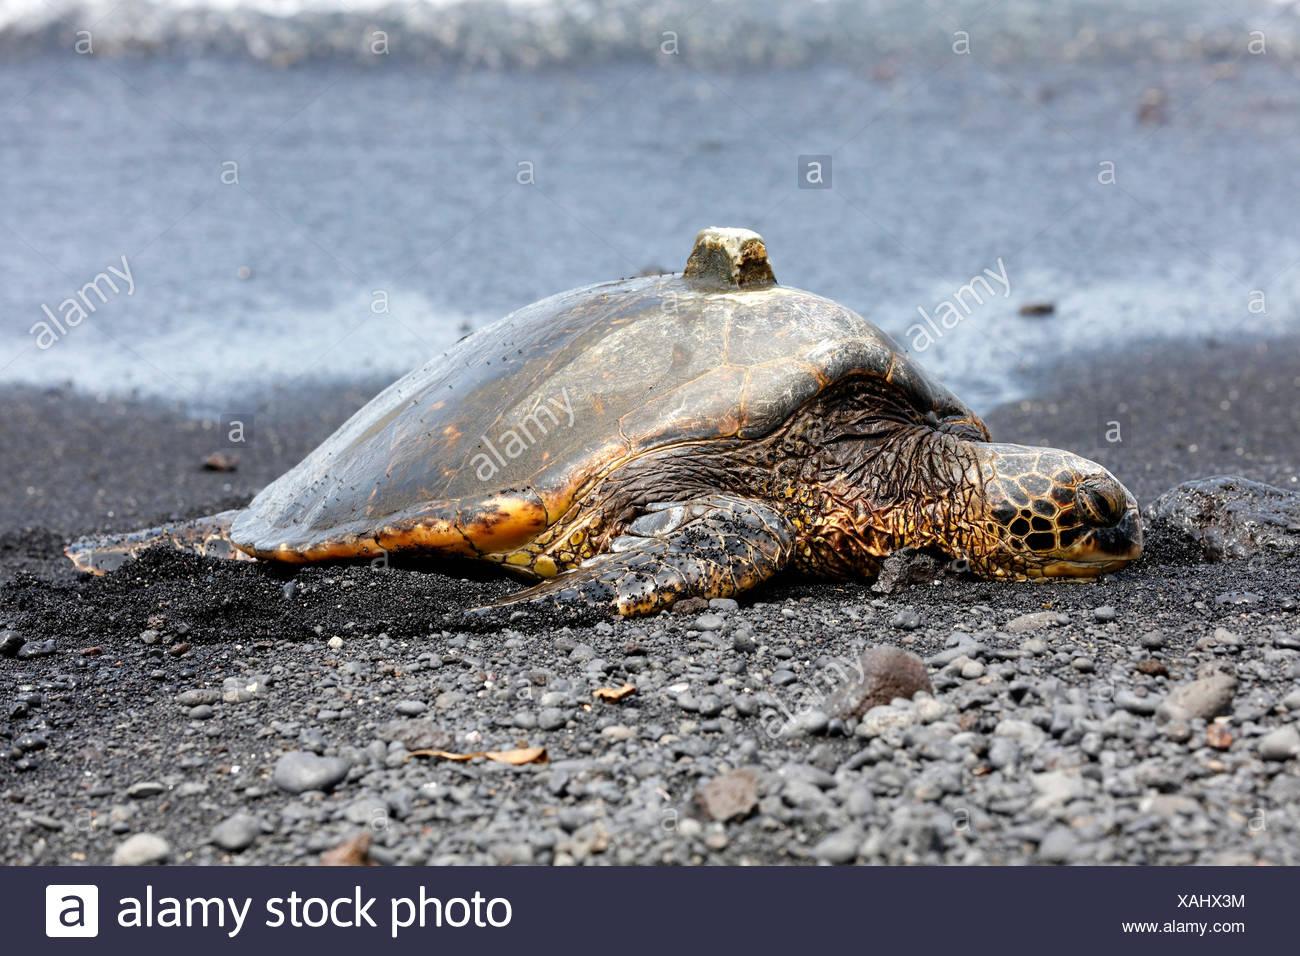 Green sea turtle (Chelonia mydas) with GPS receiver on shell, Black Sand Beach, Punalu'u, Big Island, Hawaii, USA - Stock Image